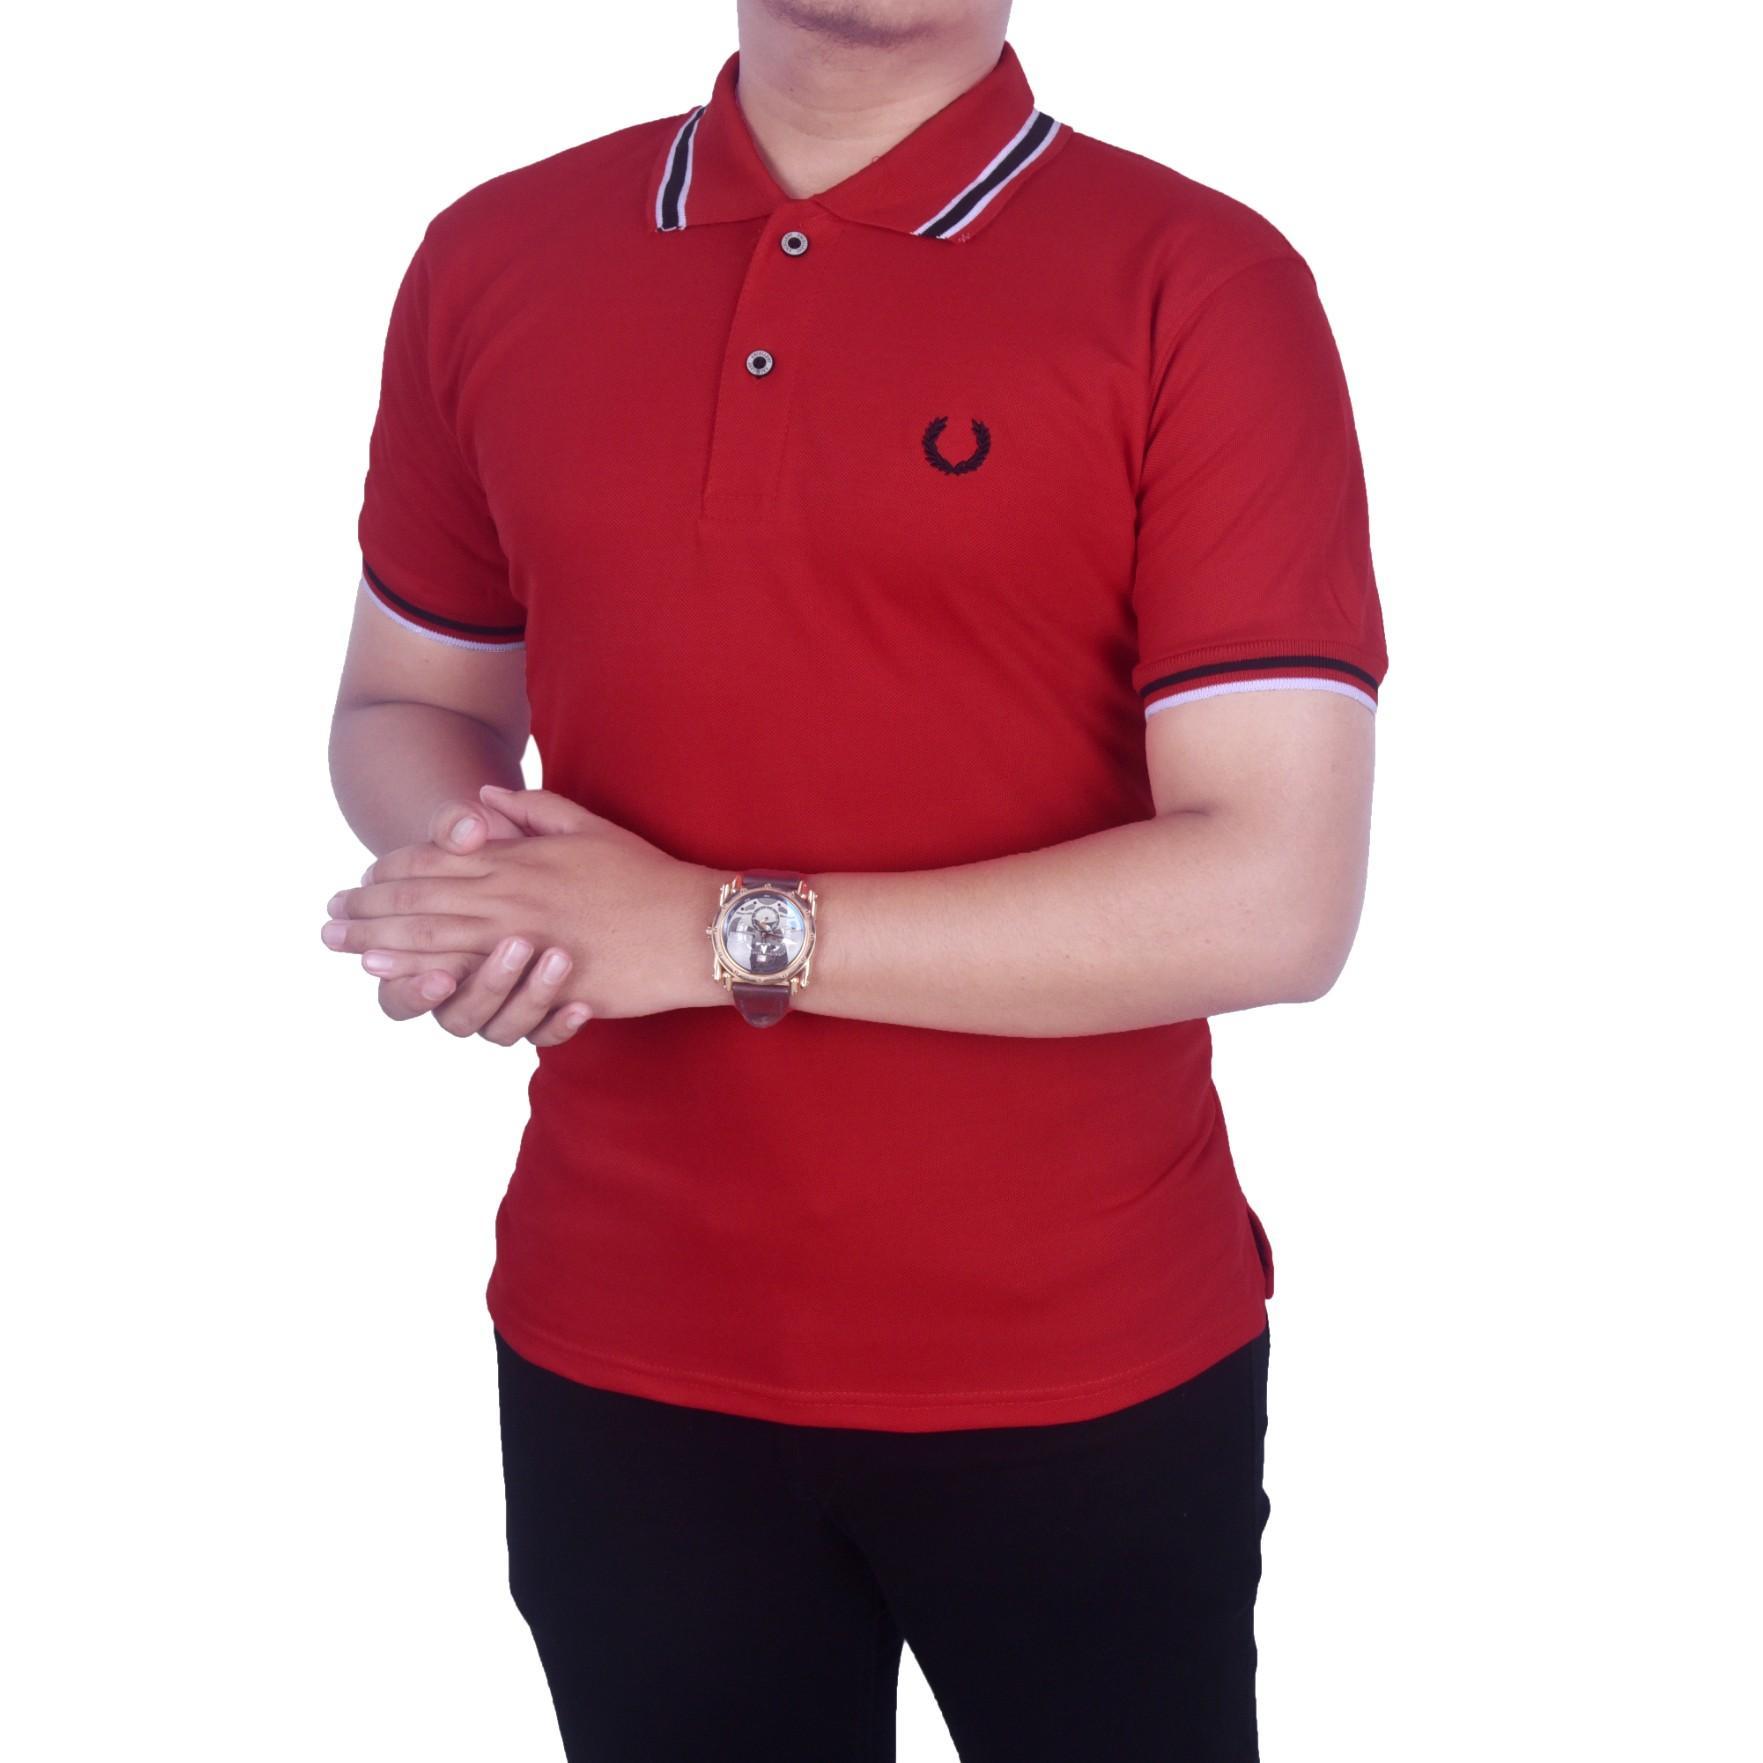 Polo Shirt Pria Terbaru Murah Kaos Kerah Polos  Grosir Bordir Dgm Fashion1 Baju Merah Pantai